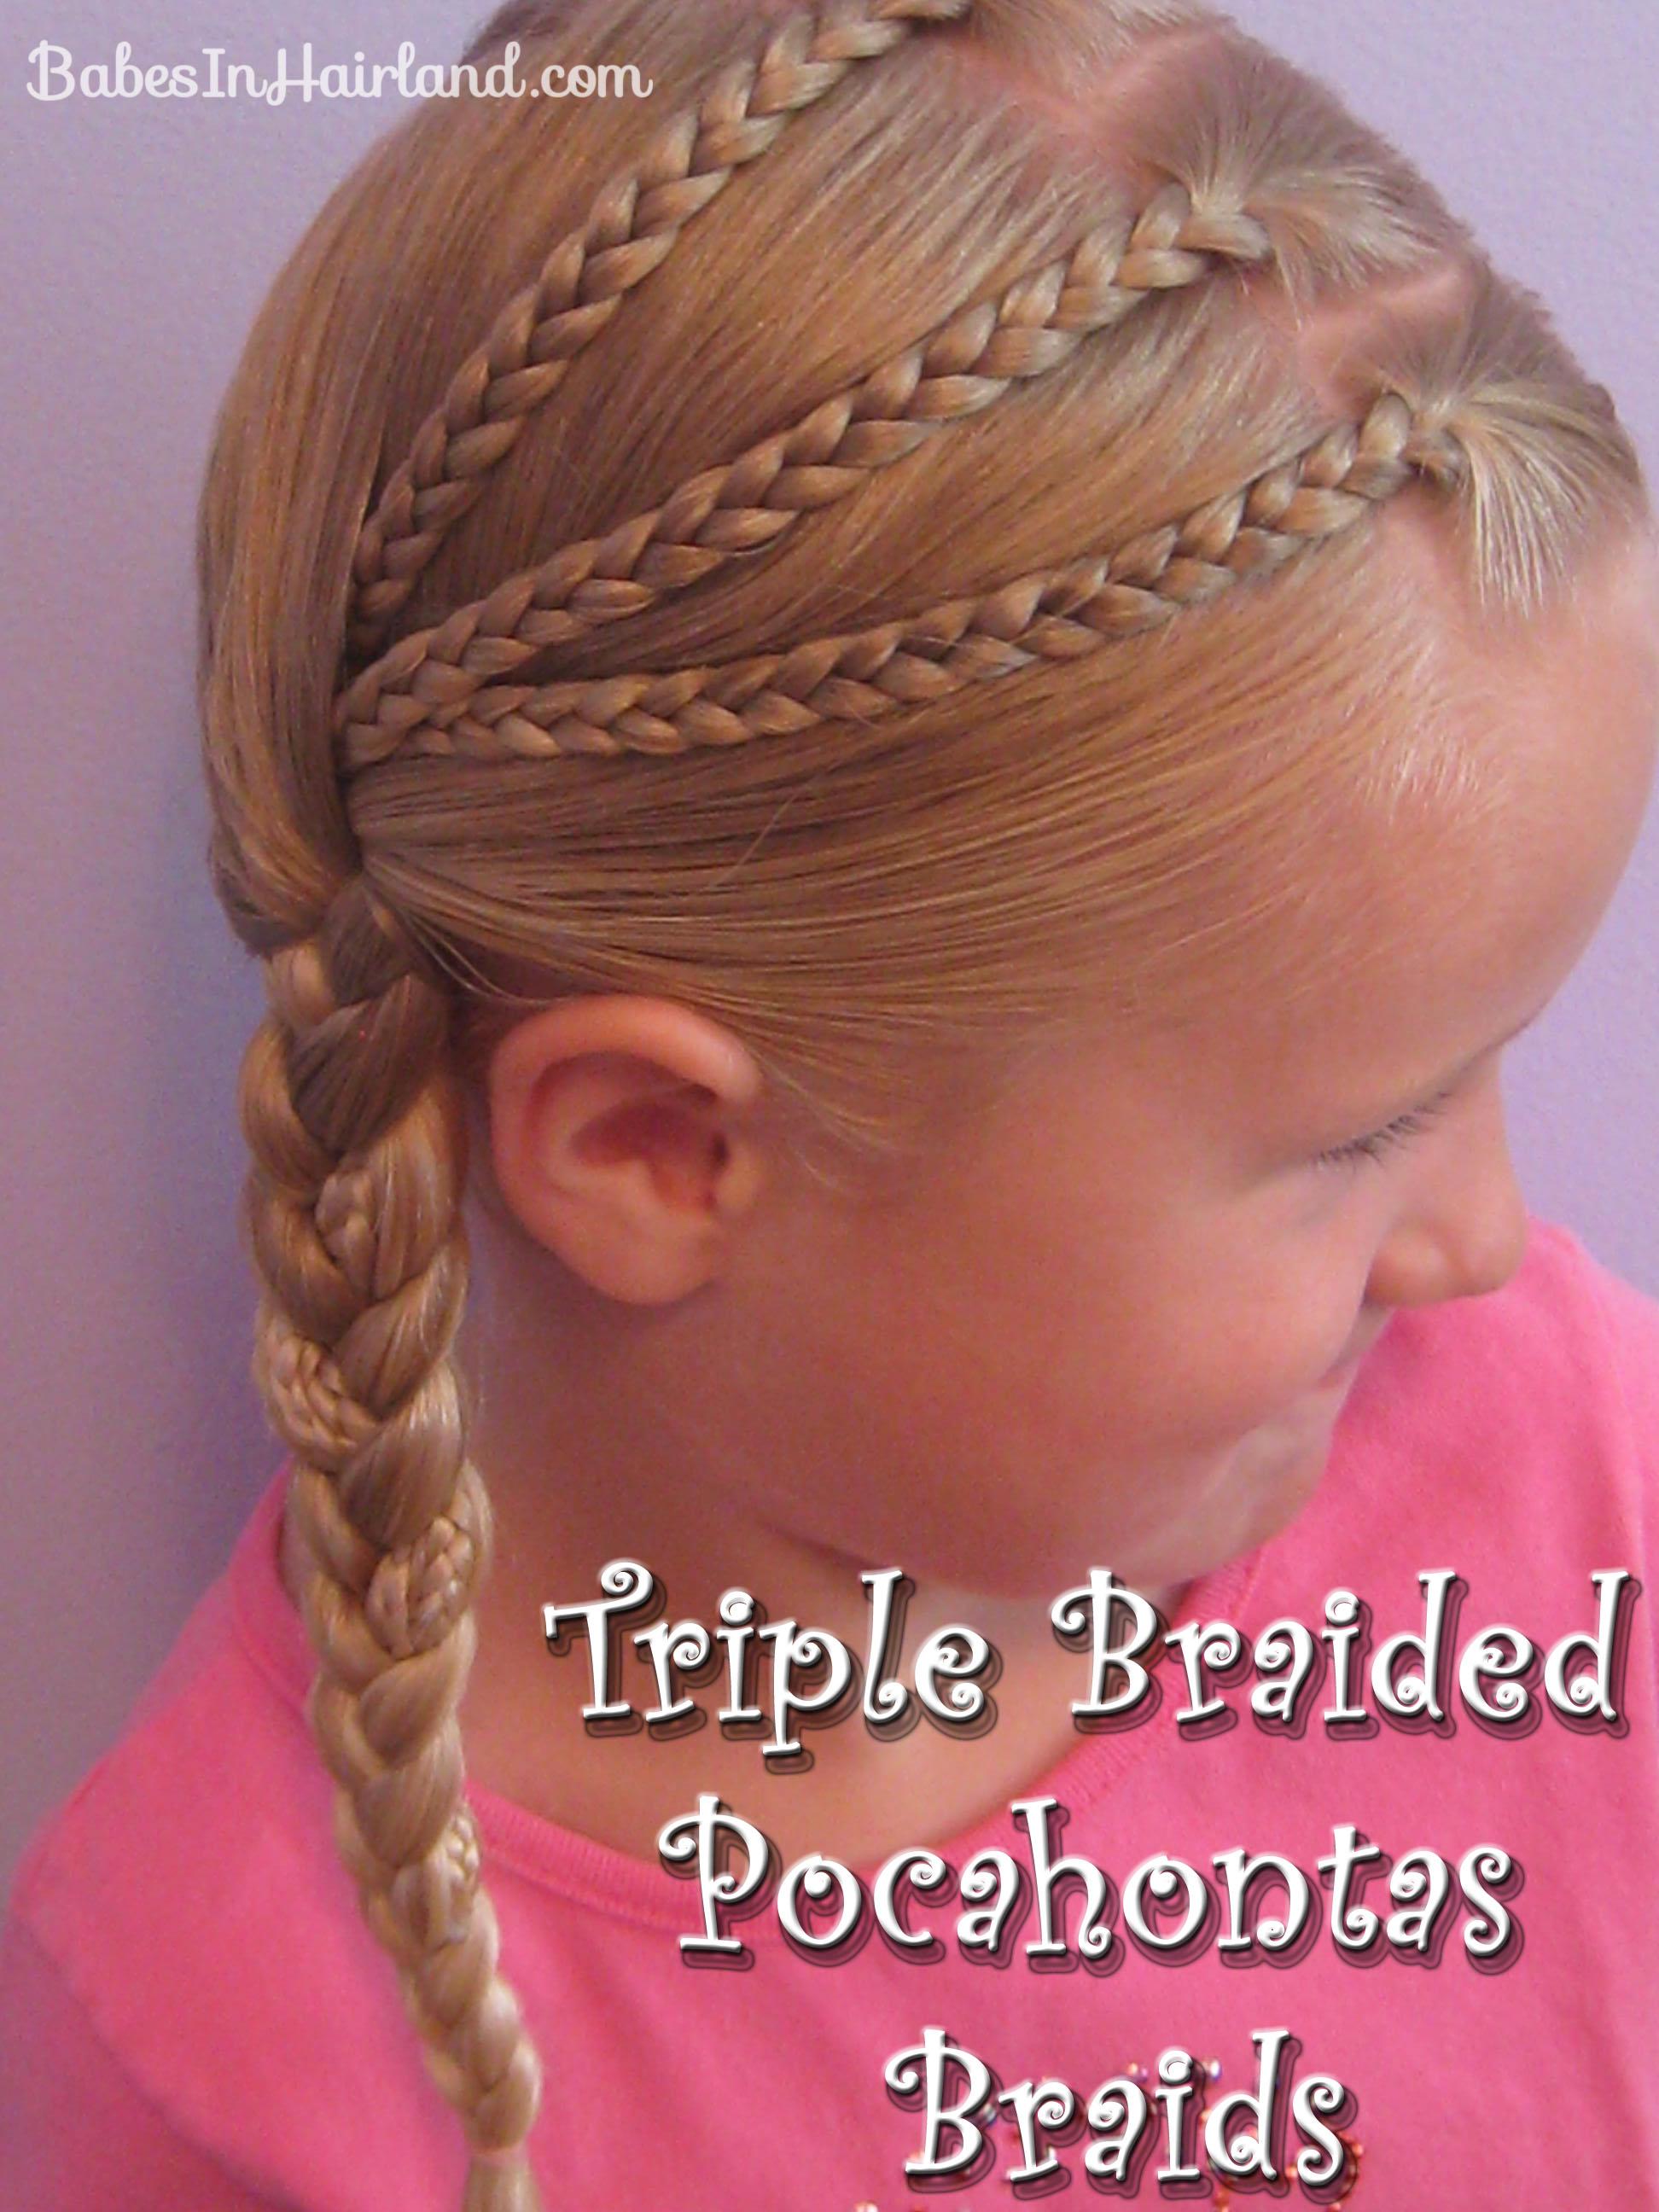 Prime 20 Back To Scohol Braids Babes In Hairland Short Hairstyles Gunalazisus